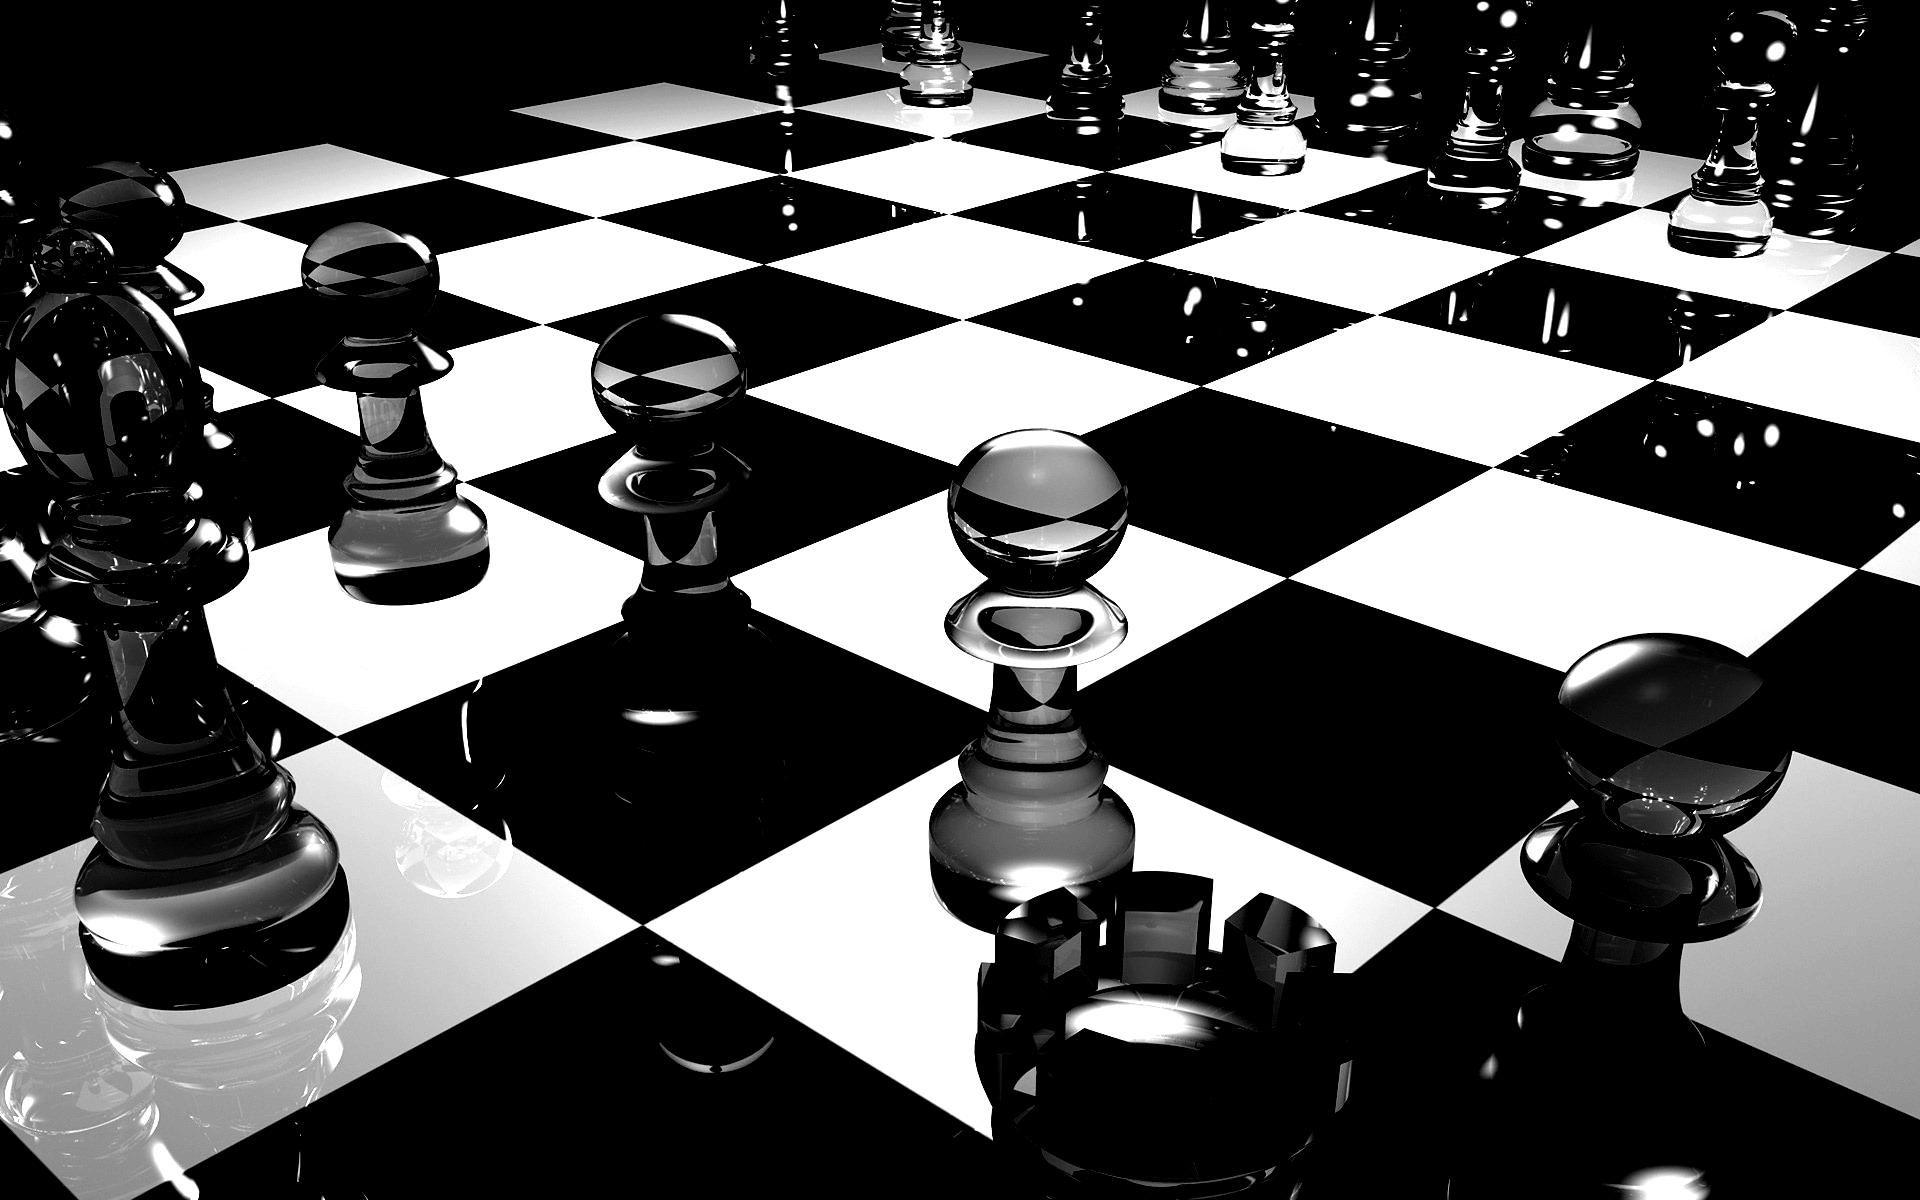 Chess Board Glass Black White Surface Oj2 Papel De Parede Preto E Branco Papel De Parede Preto Xadrez Jogo